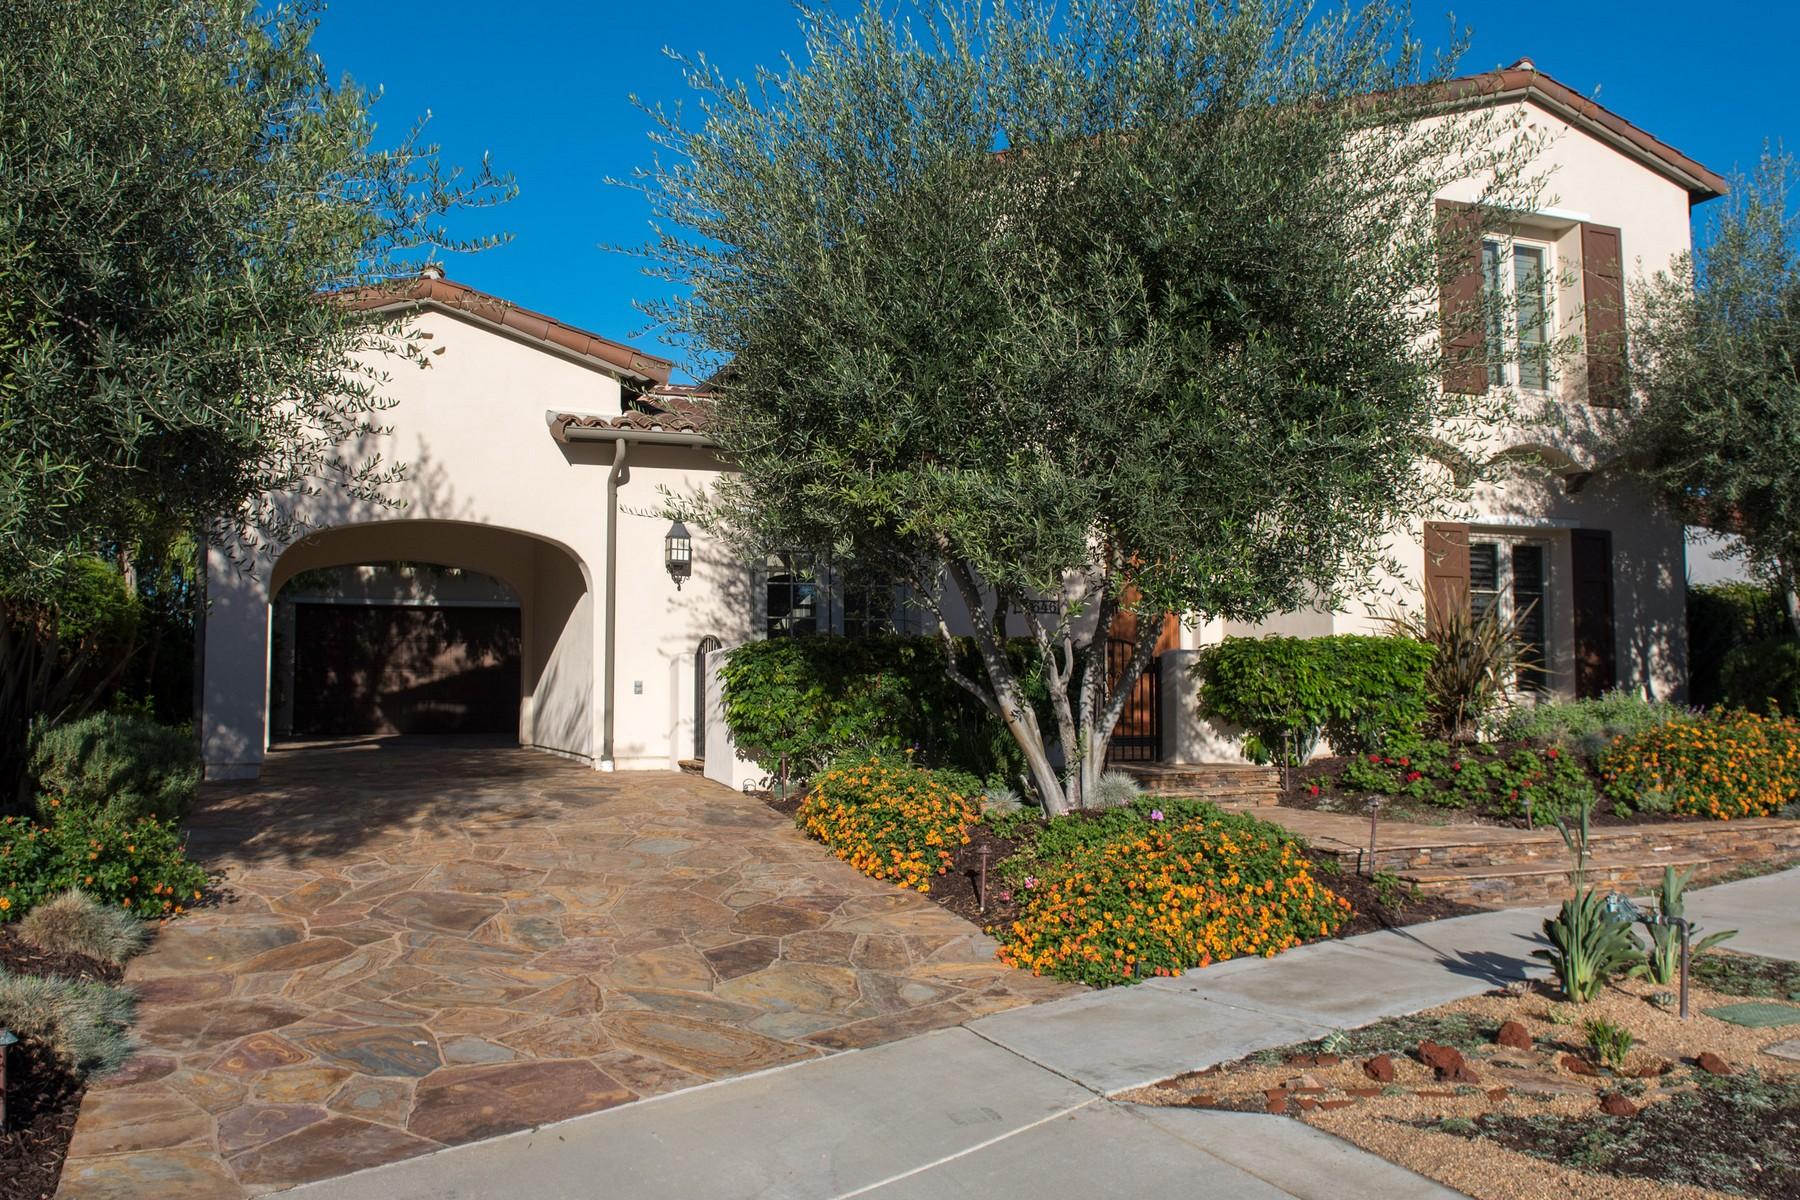 Additional photo for property listing at 14646 Caminito Lazanja  San Diego, Калифорния 92127 Соединенные Штаты